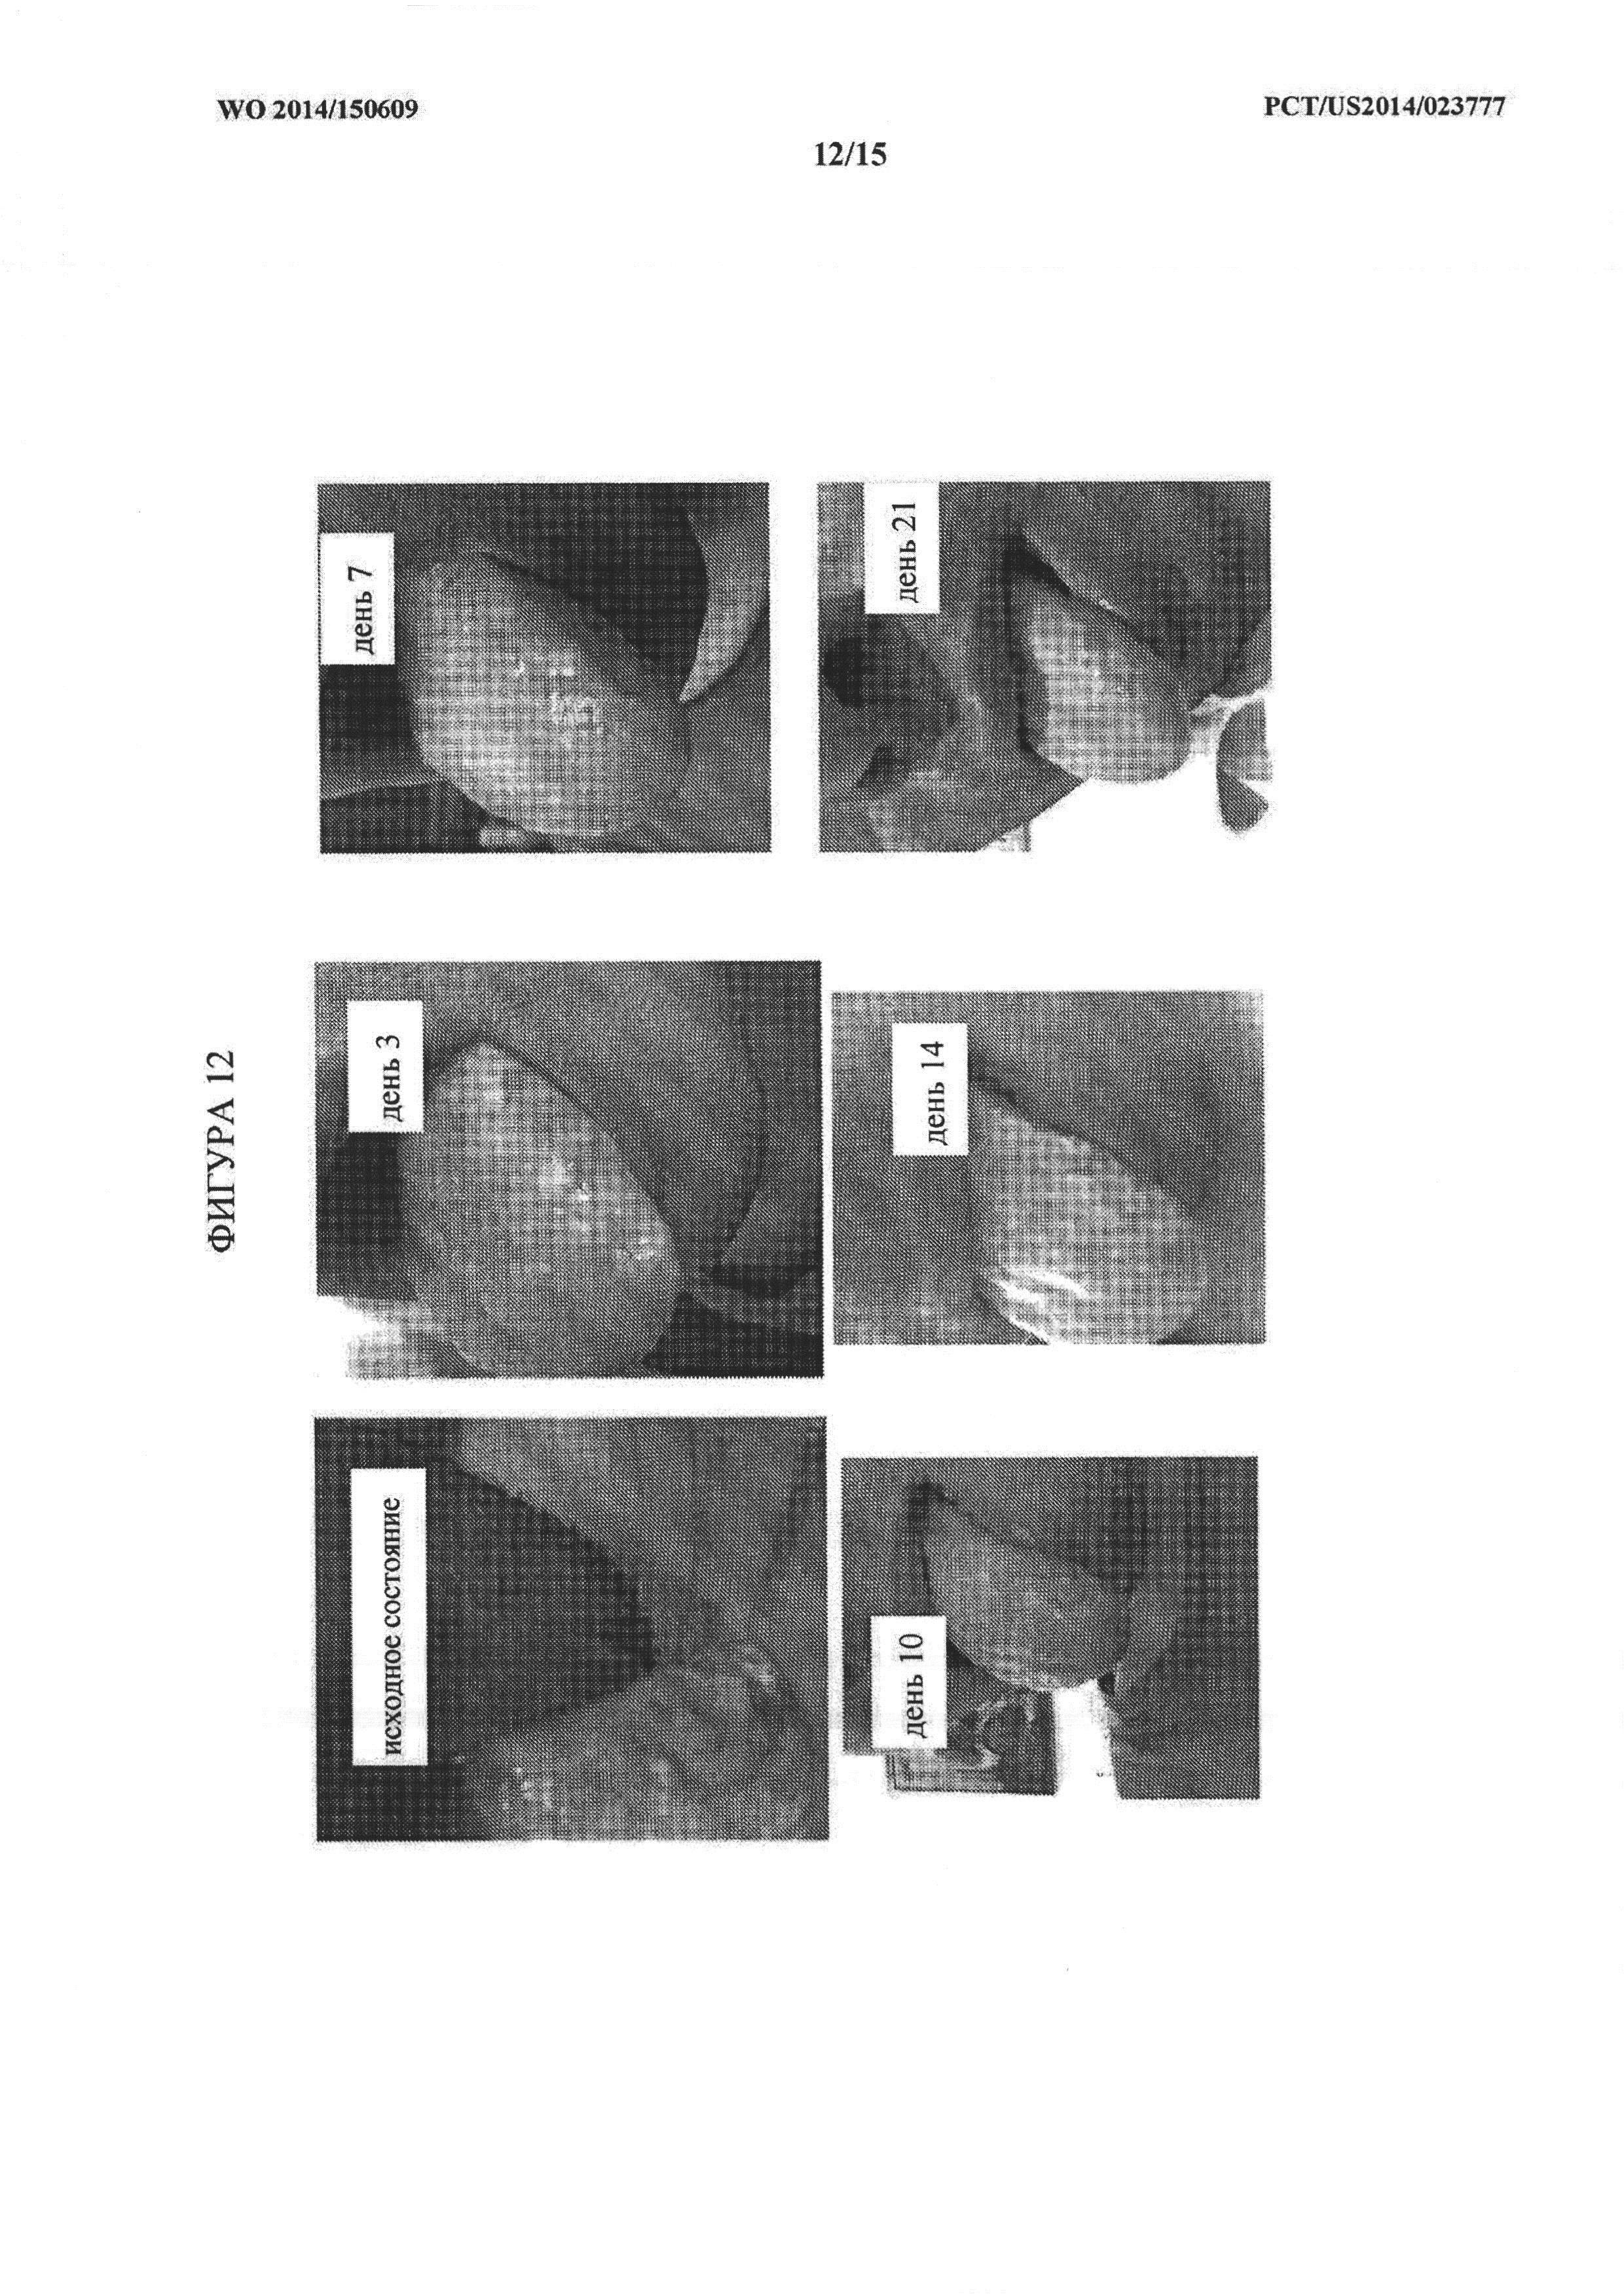 Влияние L тироксина на фигуру, ум и репродуктивную функцию